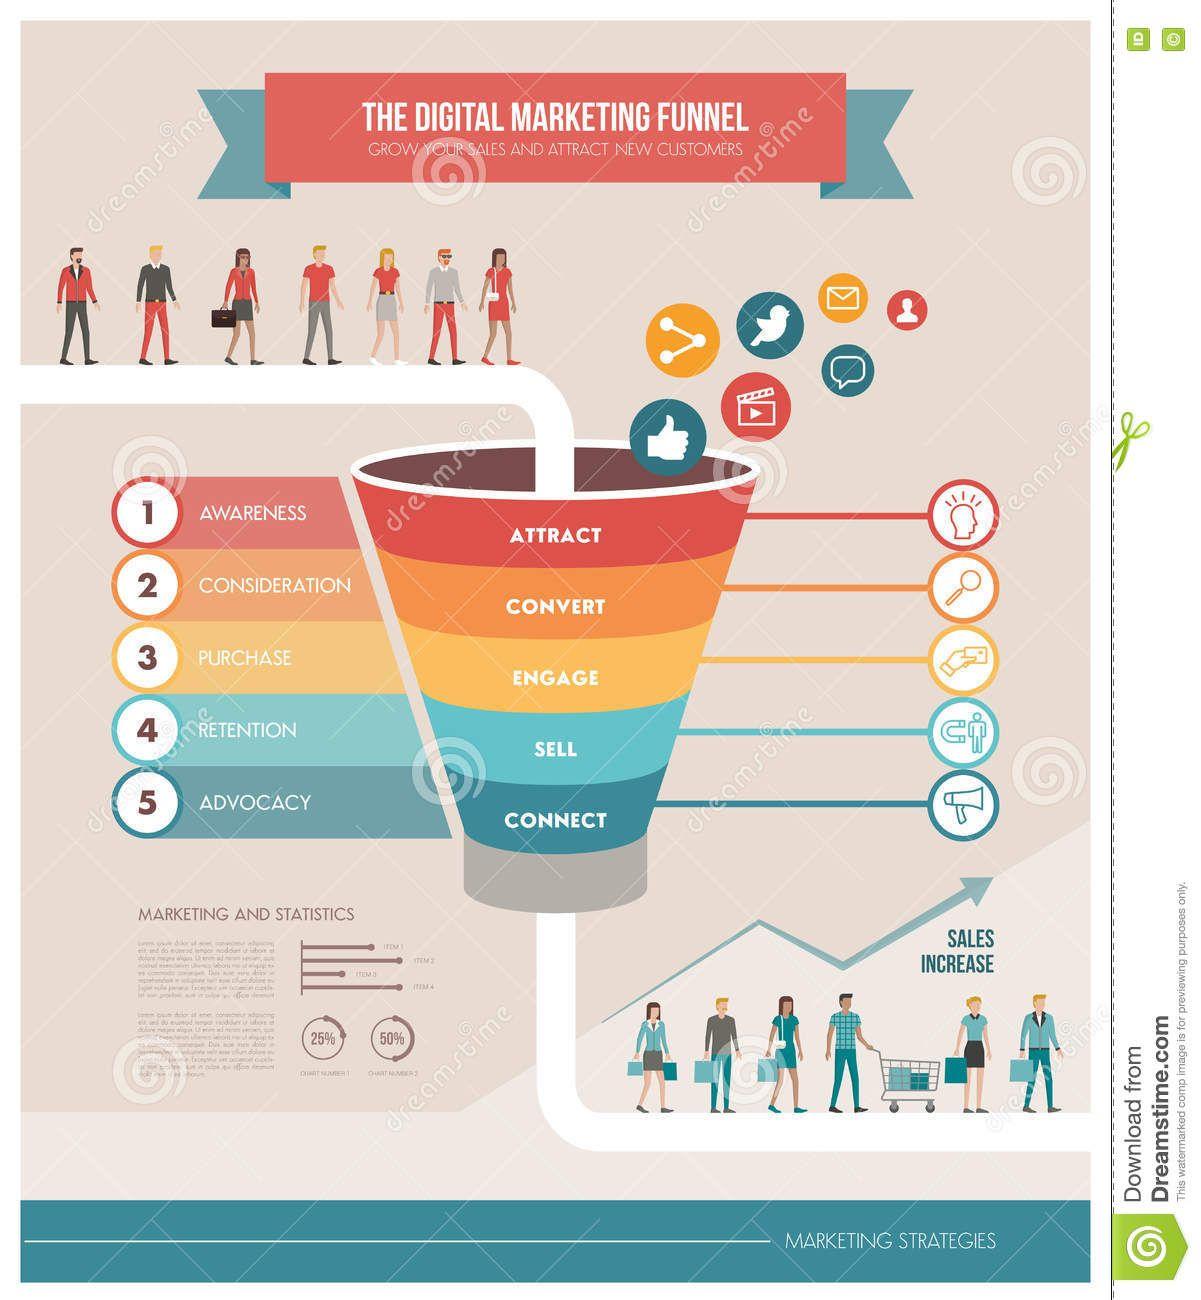 The Digital Marketing Funnel Stock Vector - Image ...